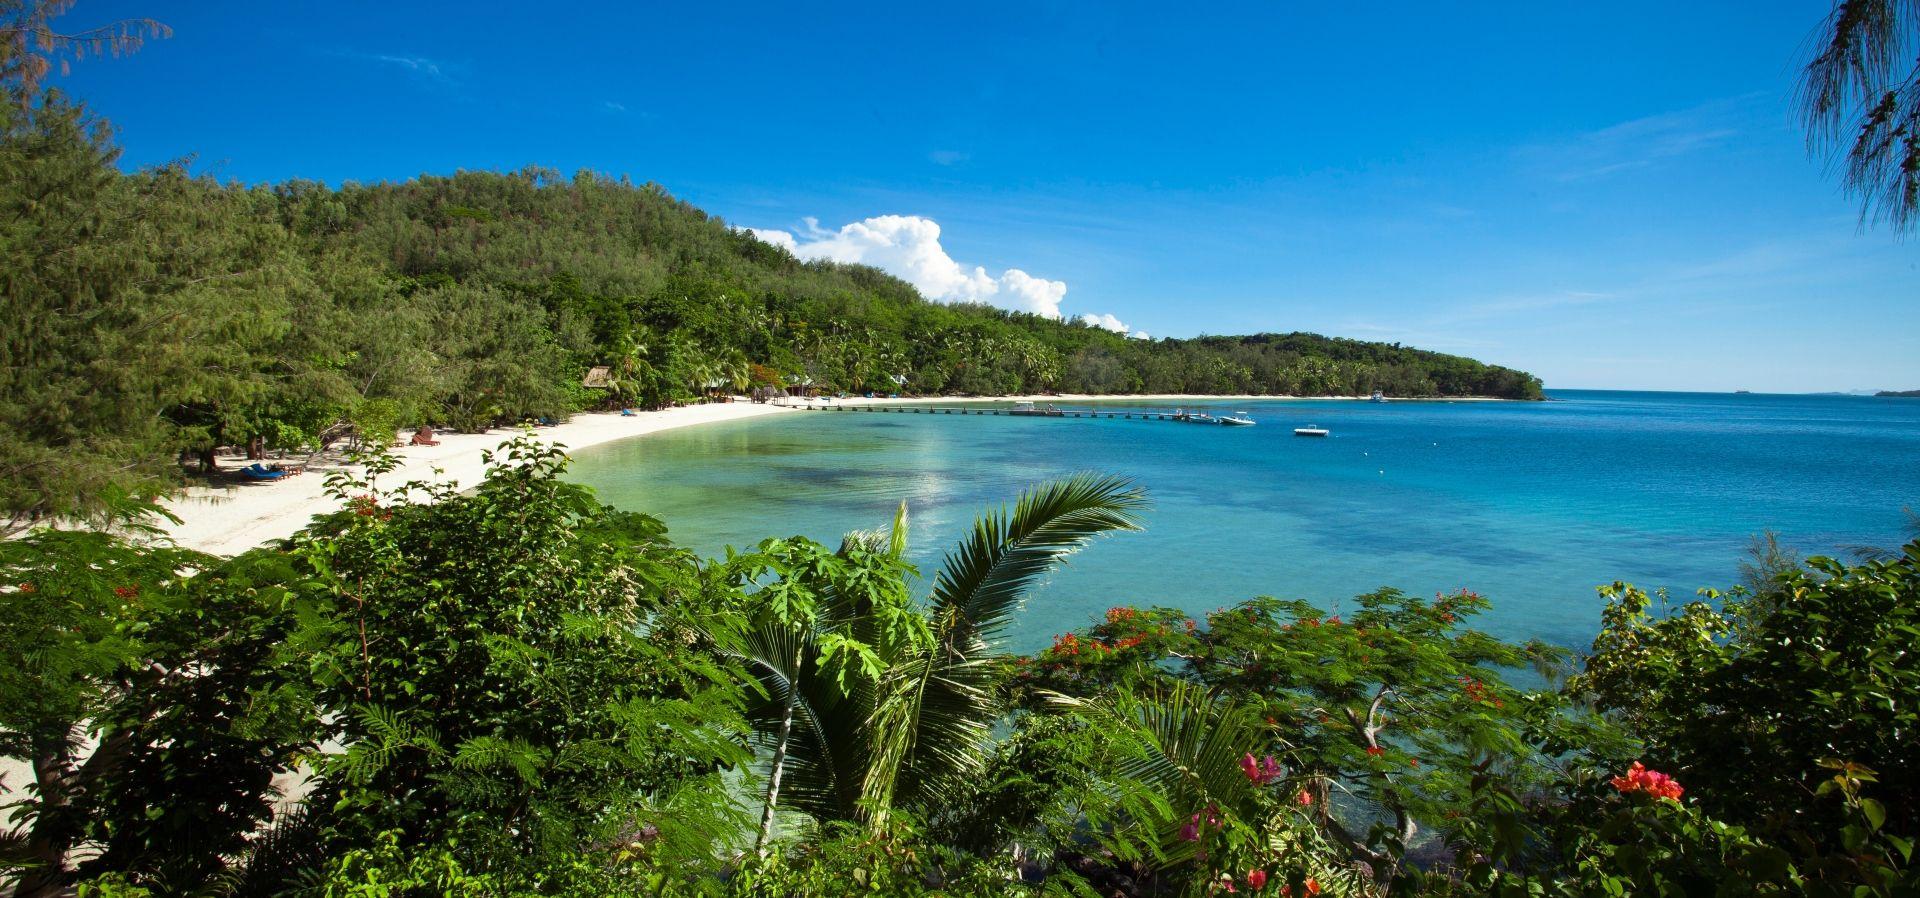 Turtle Island main beach